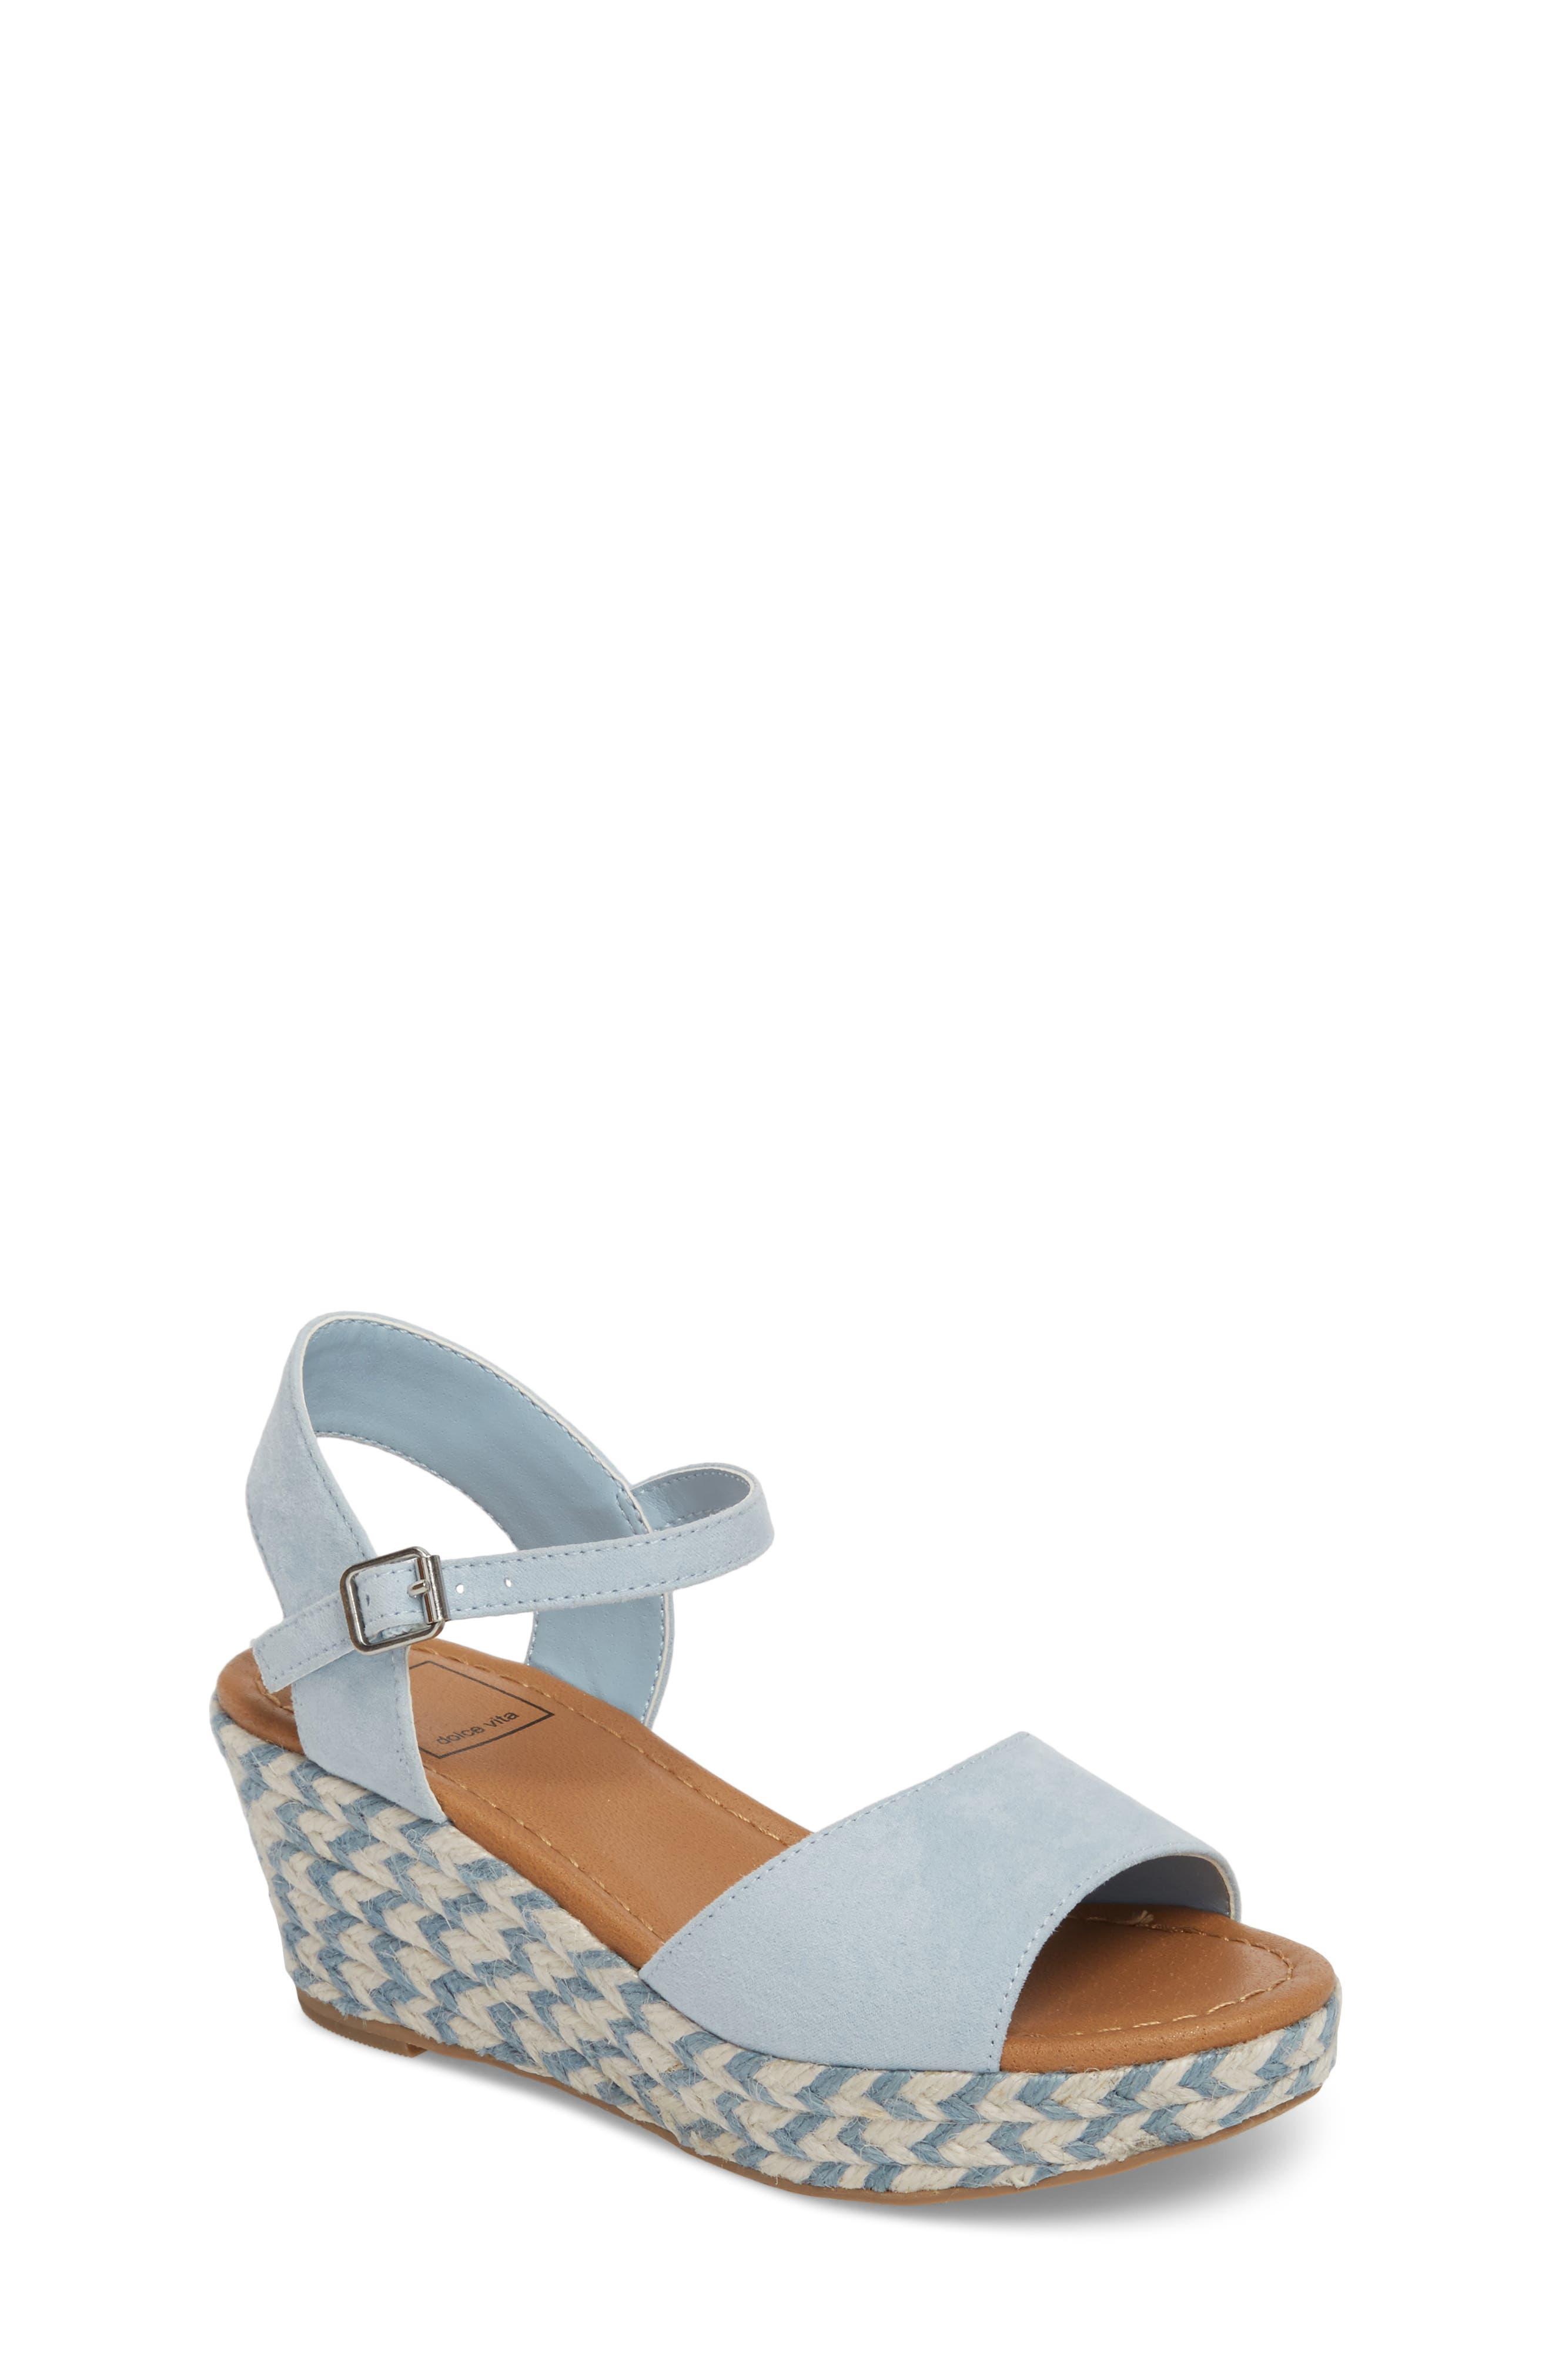 Wendy Espadrille Wedge Sandal,                         Main,                         color, Light Blue